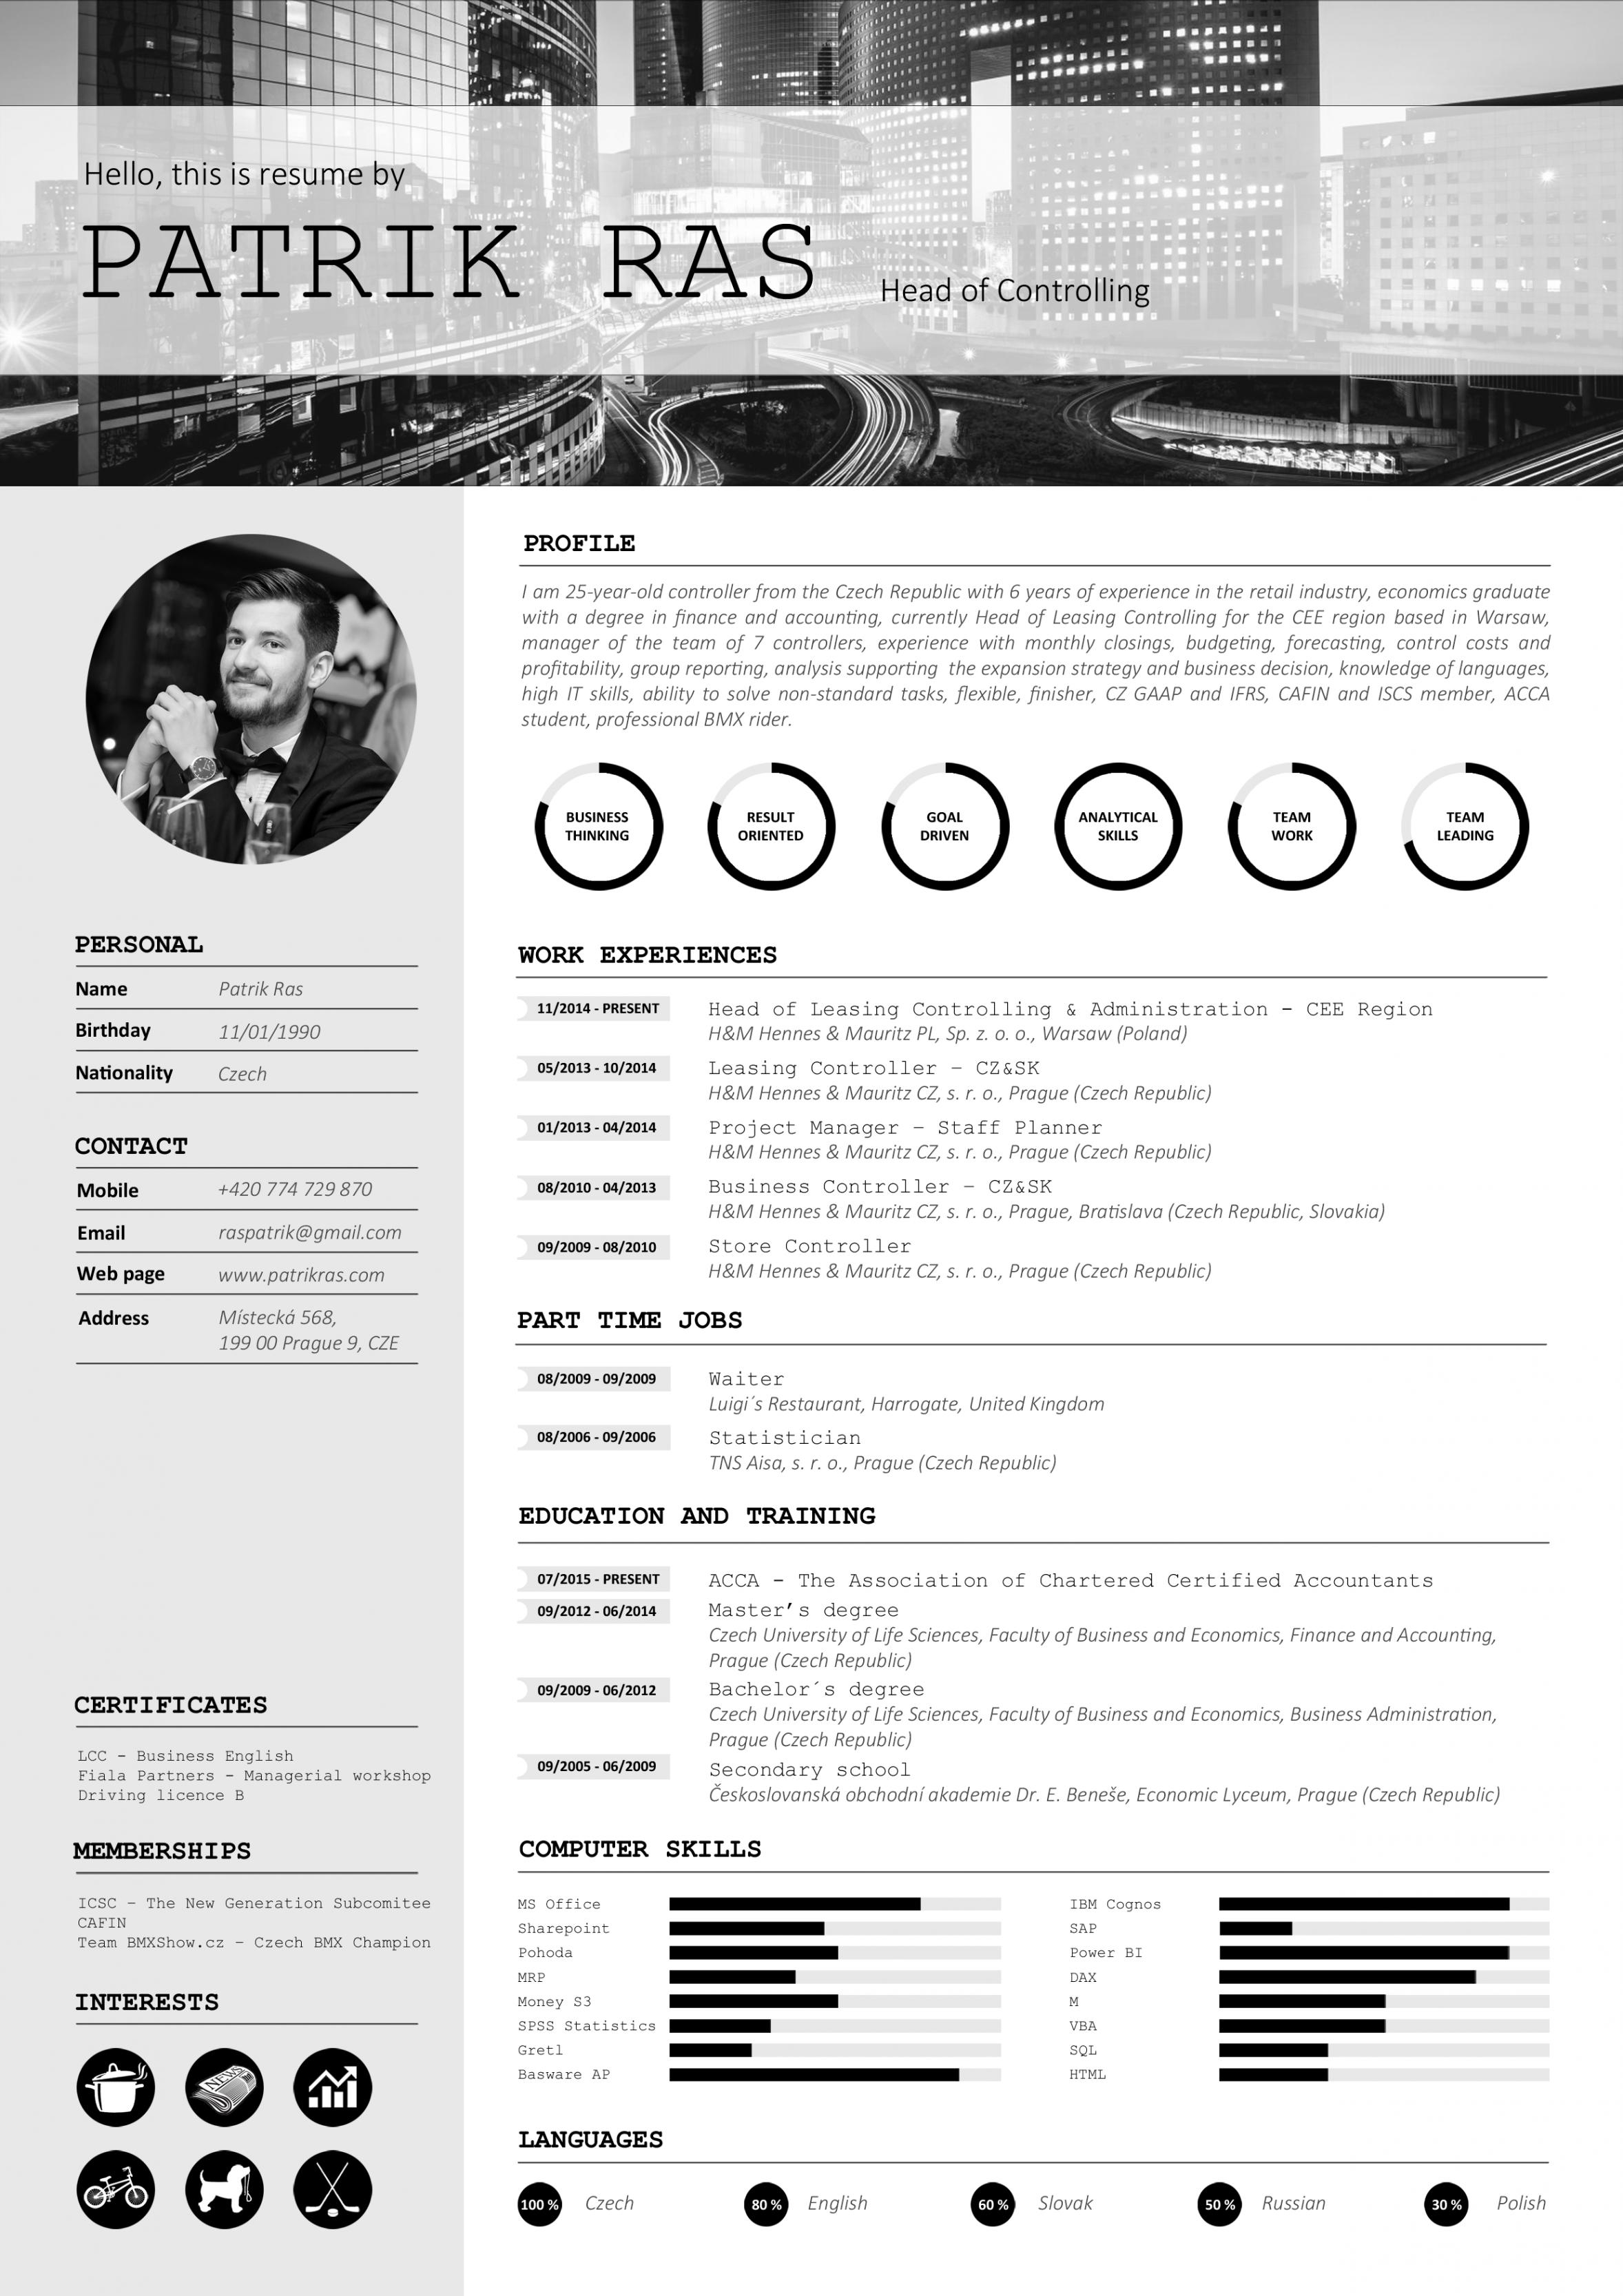 Porbe von  Resume Cv Template Graphics Blackandwhite Bw Icons Icongraphic Vorlage Lebenslauf Mit Icons